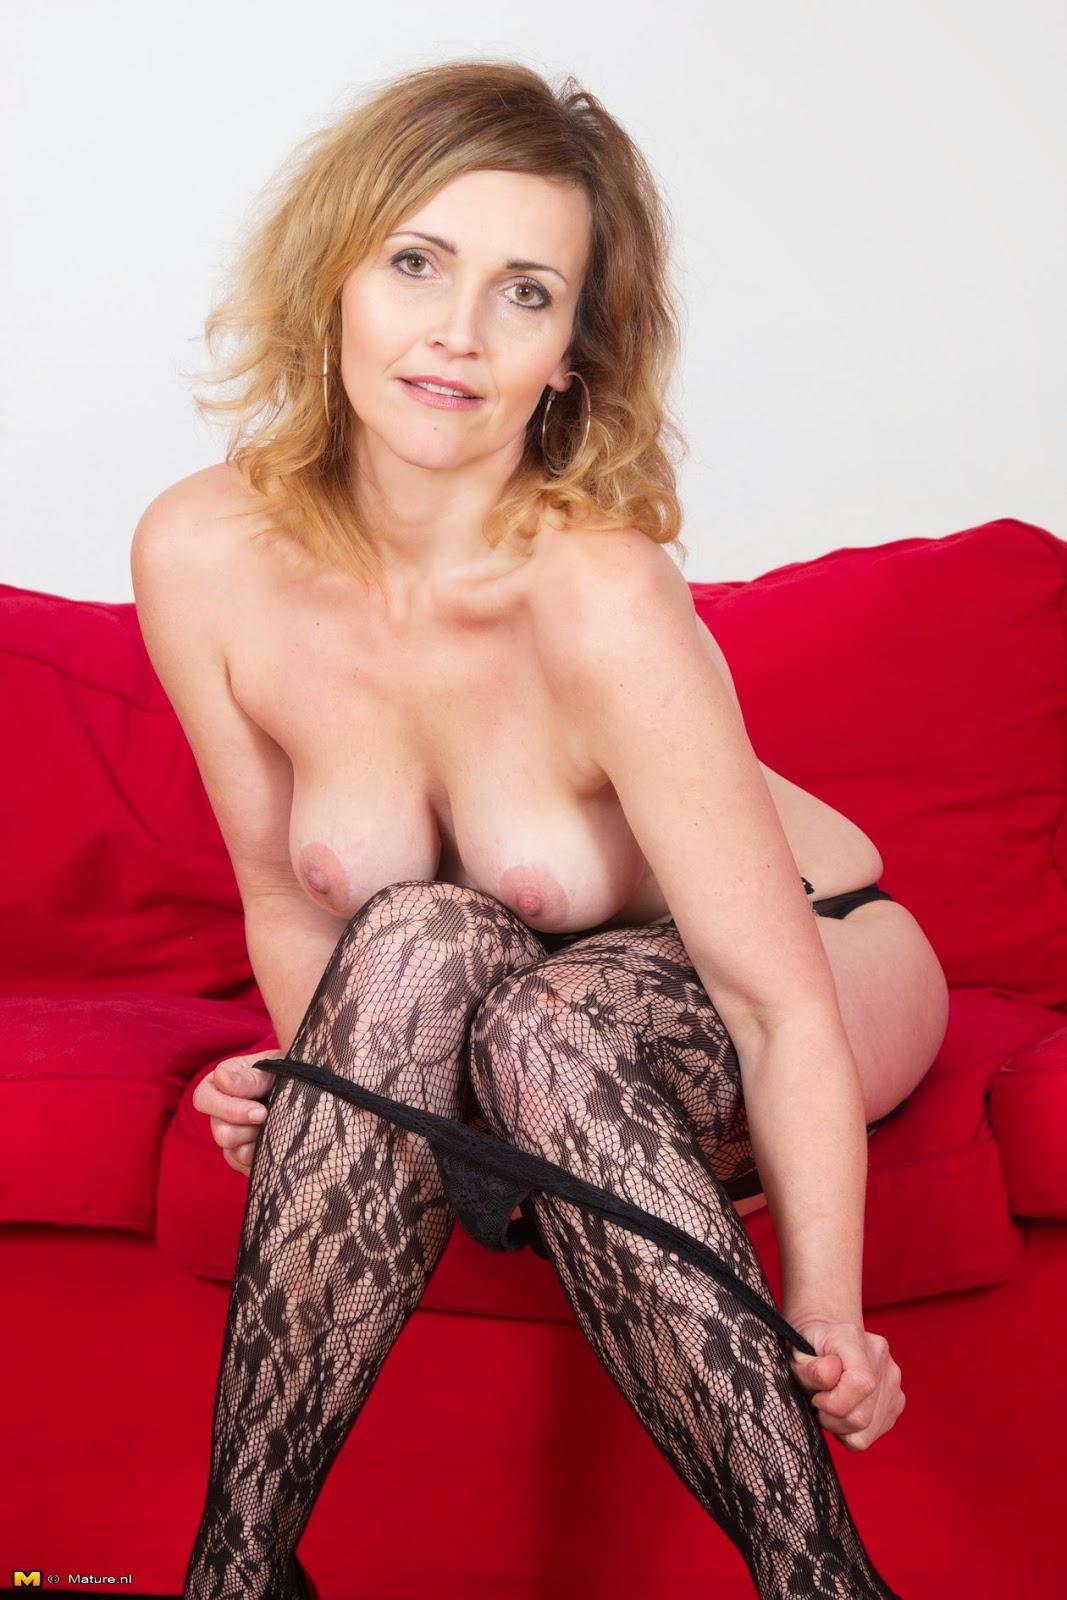 Hot sexvediovediodownload nude gallery